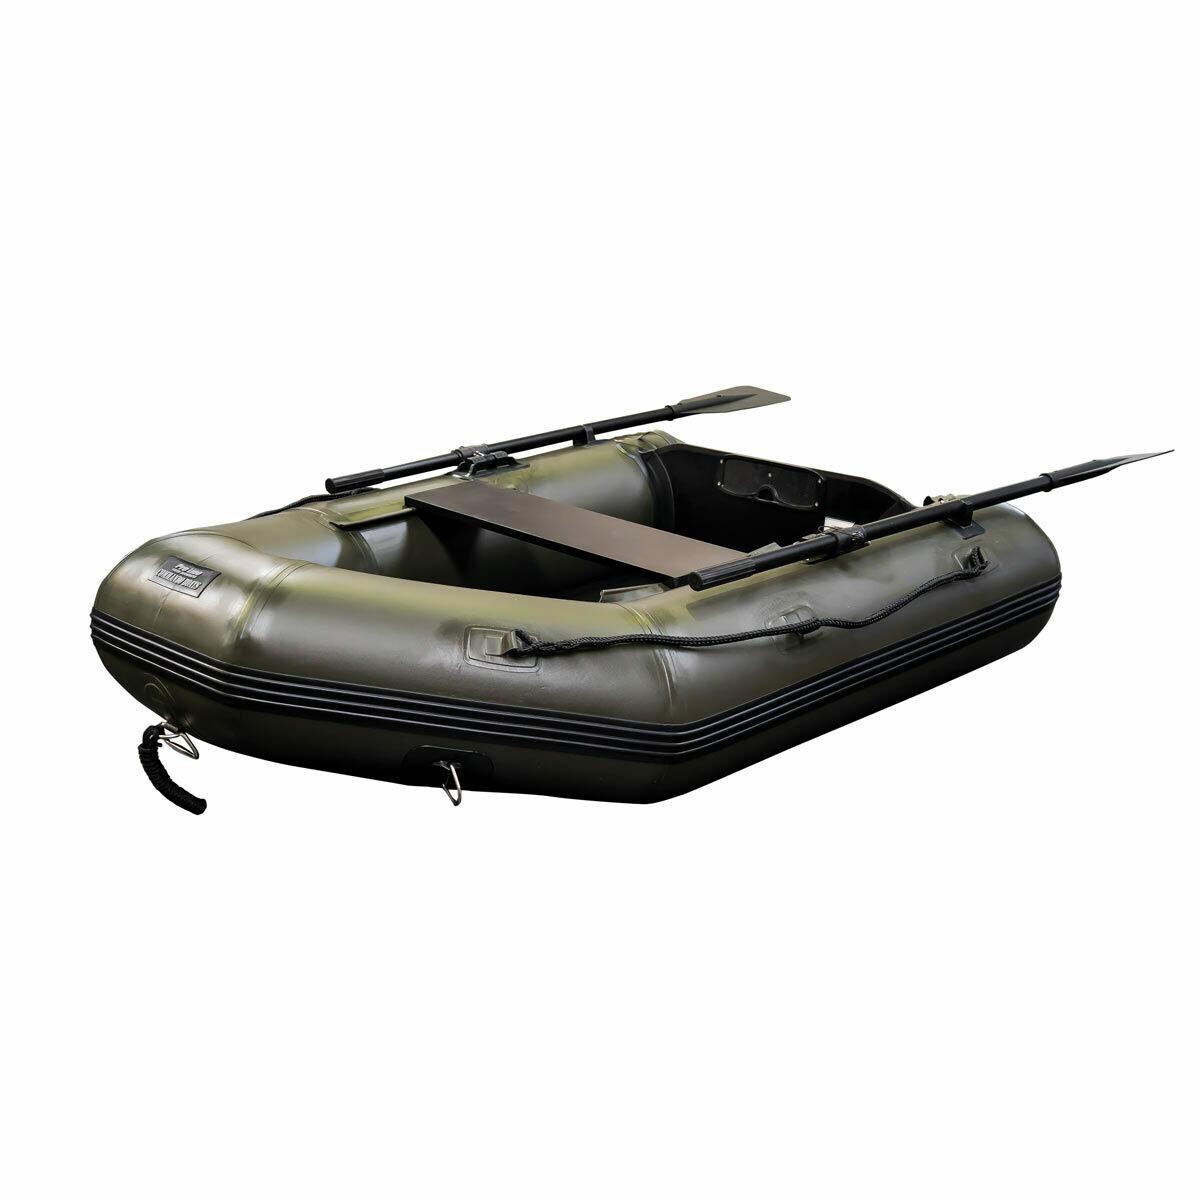 Pro line carp boat 160 AD Lightweight